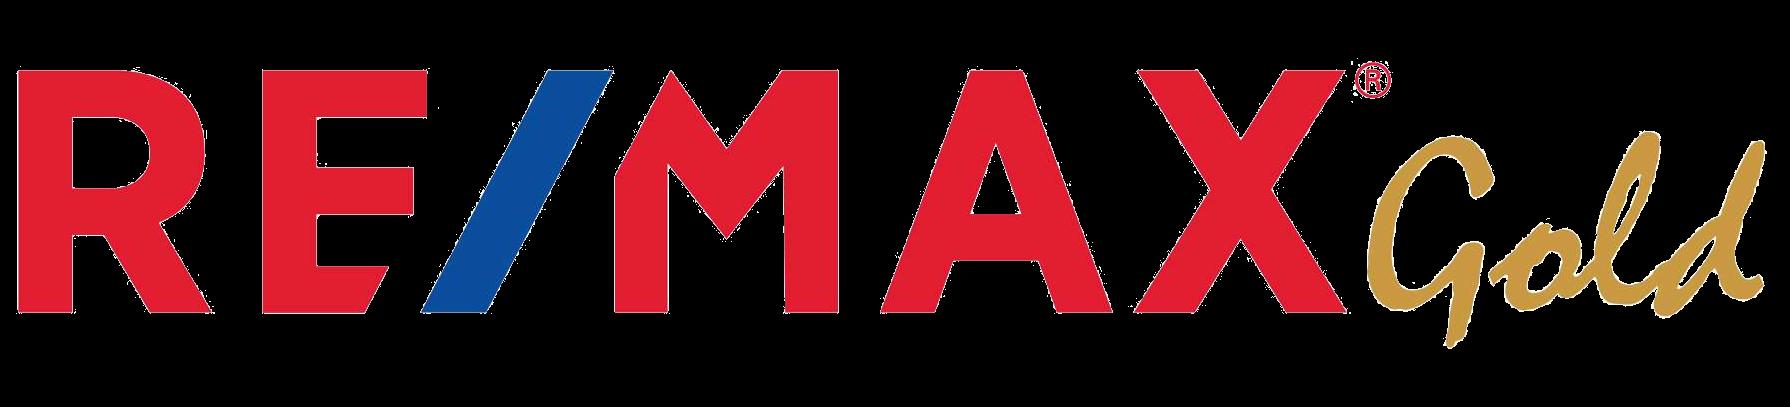 Matthew  McClellandRE/MAX Gold